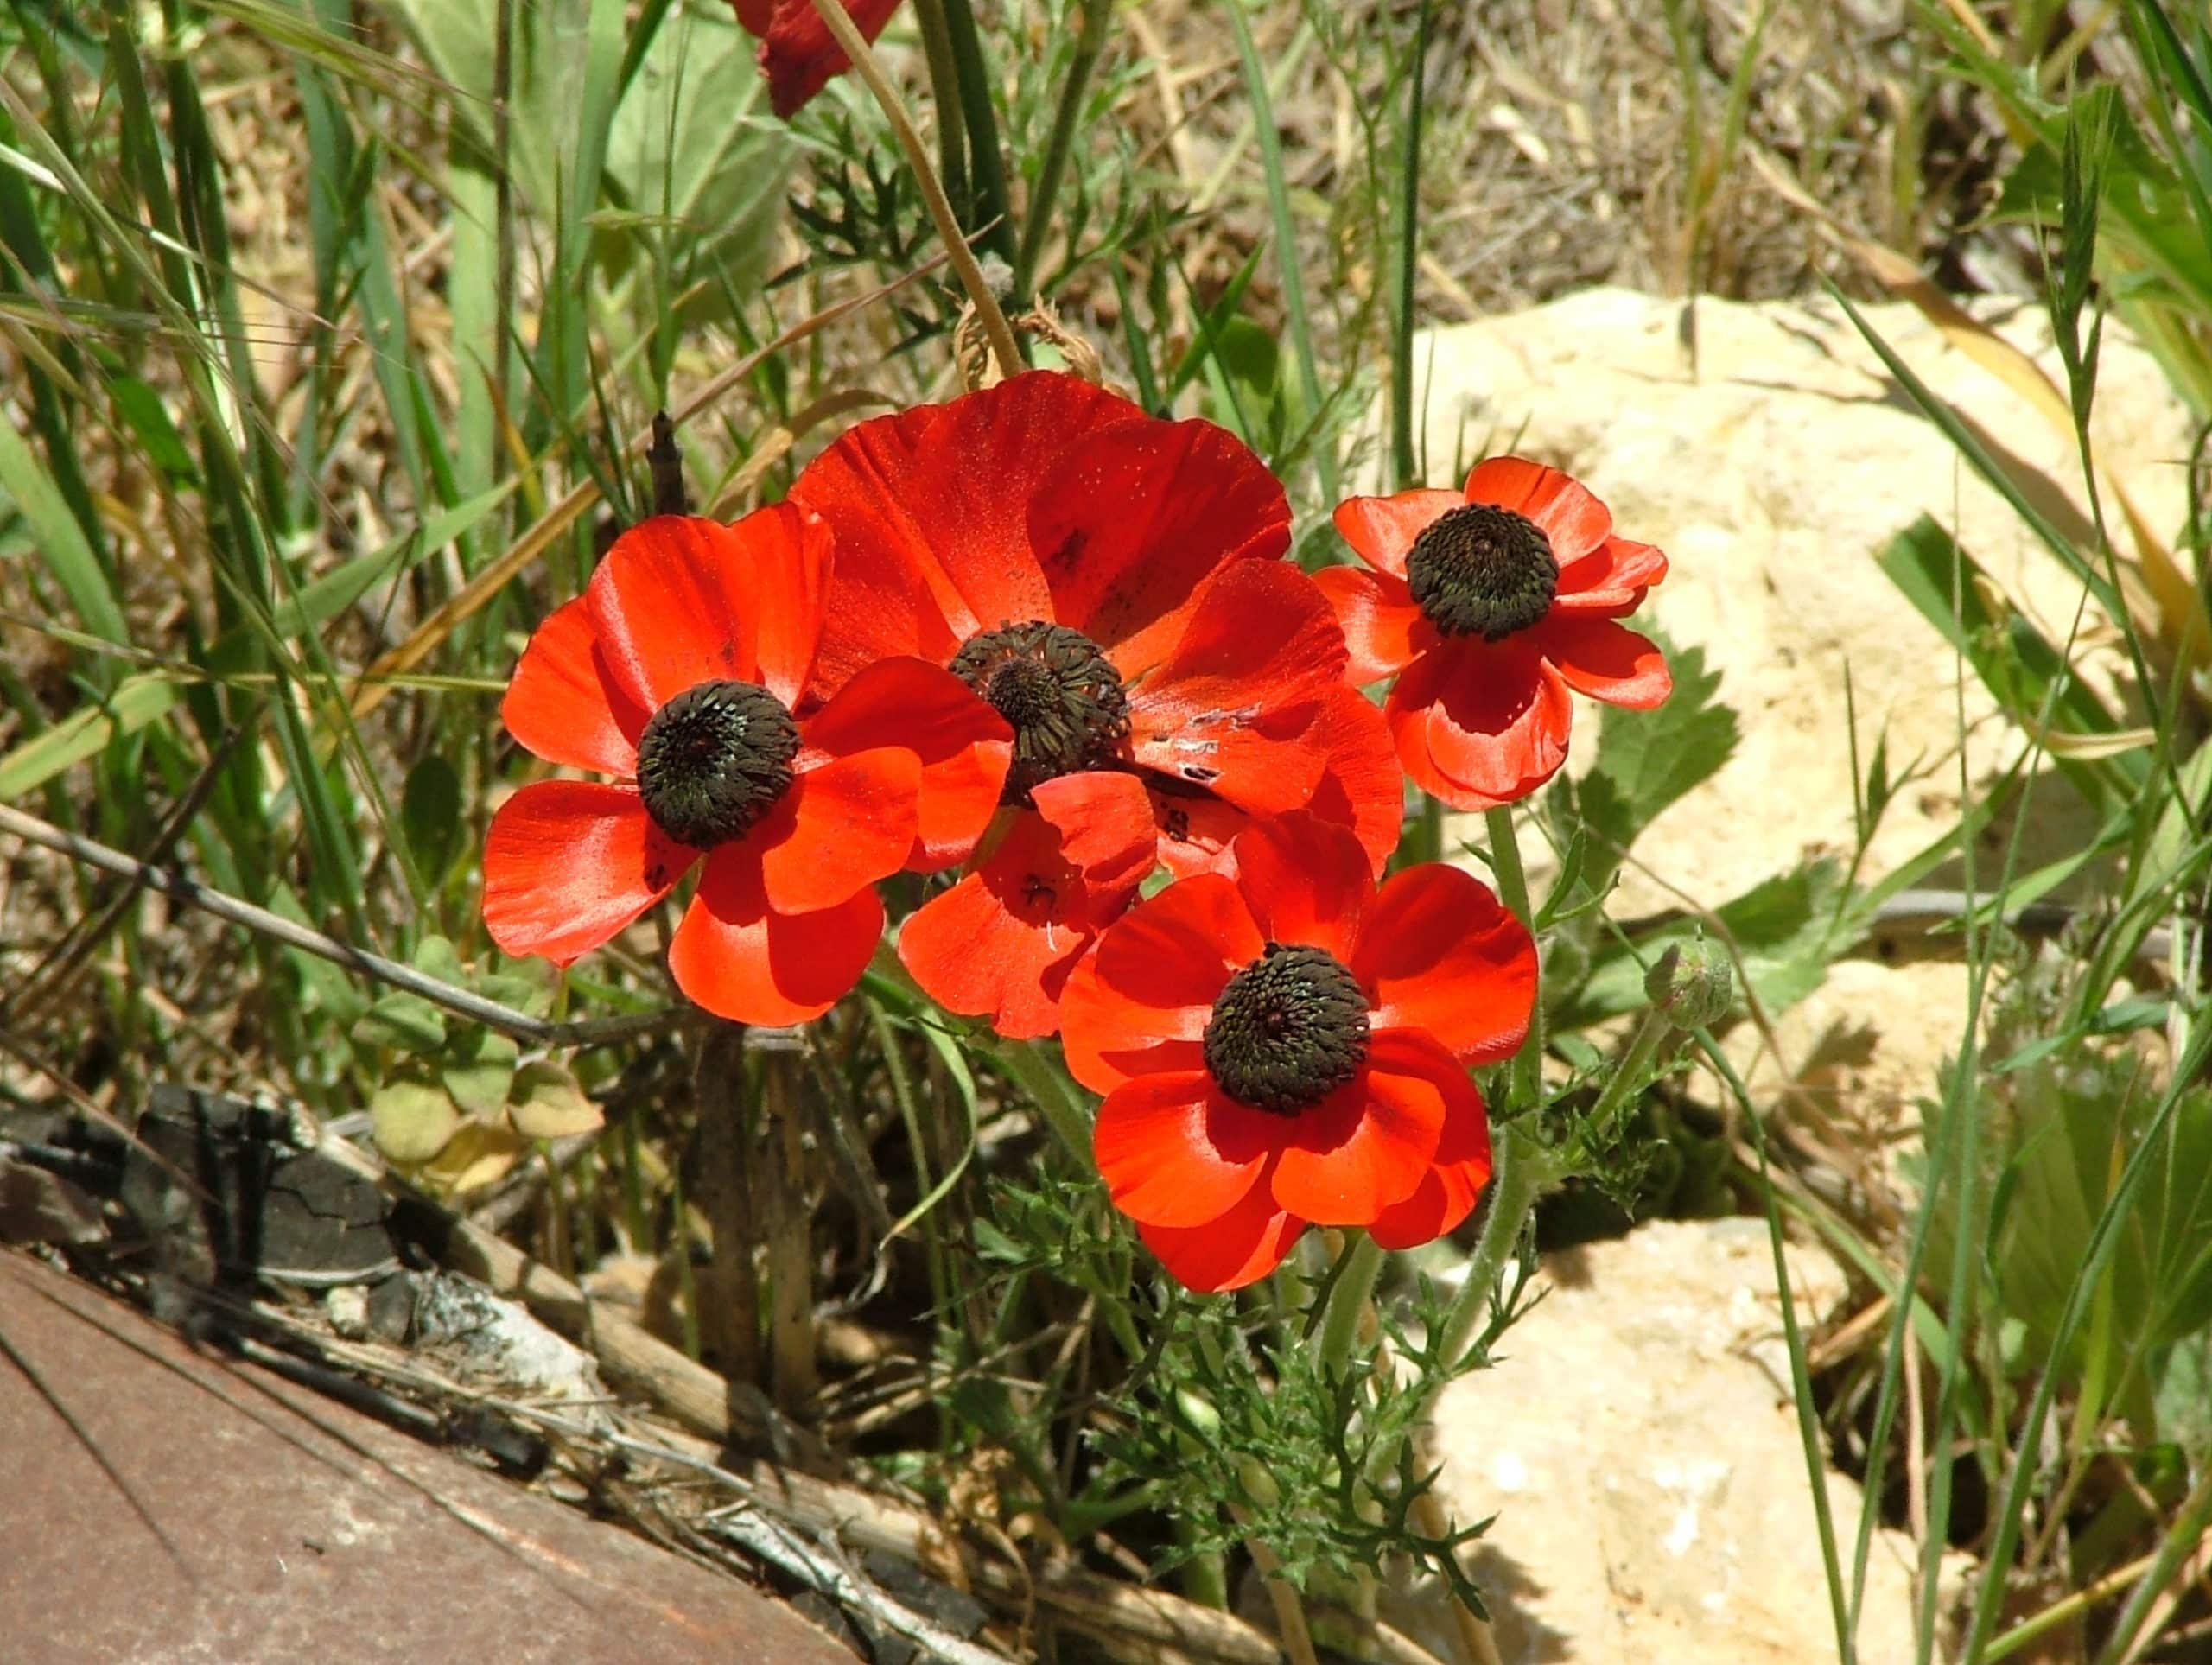 Persian Buttercup. (Ranunculus).